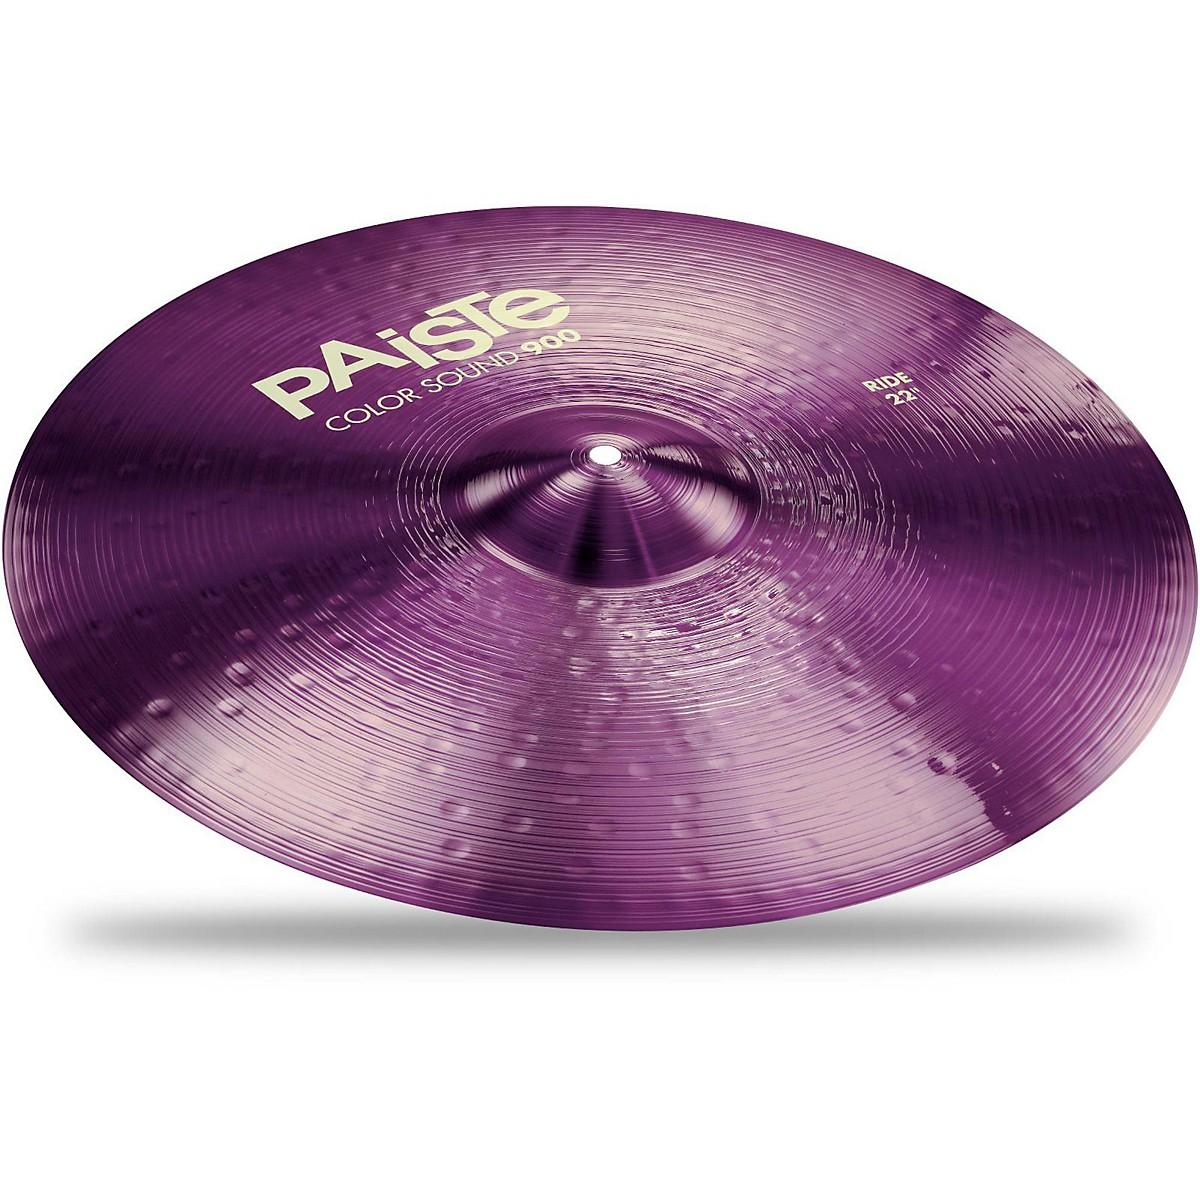 Paiste Colorsound 900 Ride Cymbal Purple